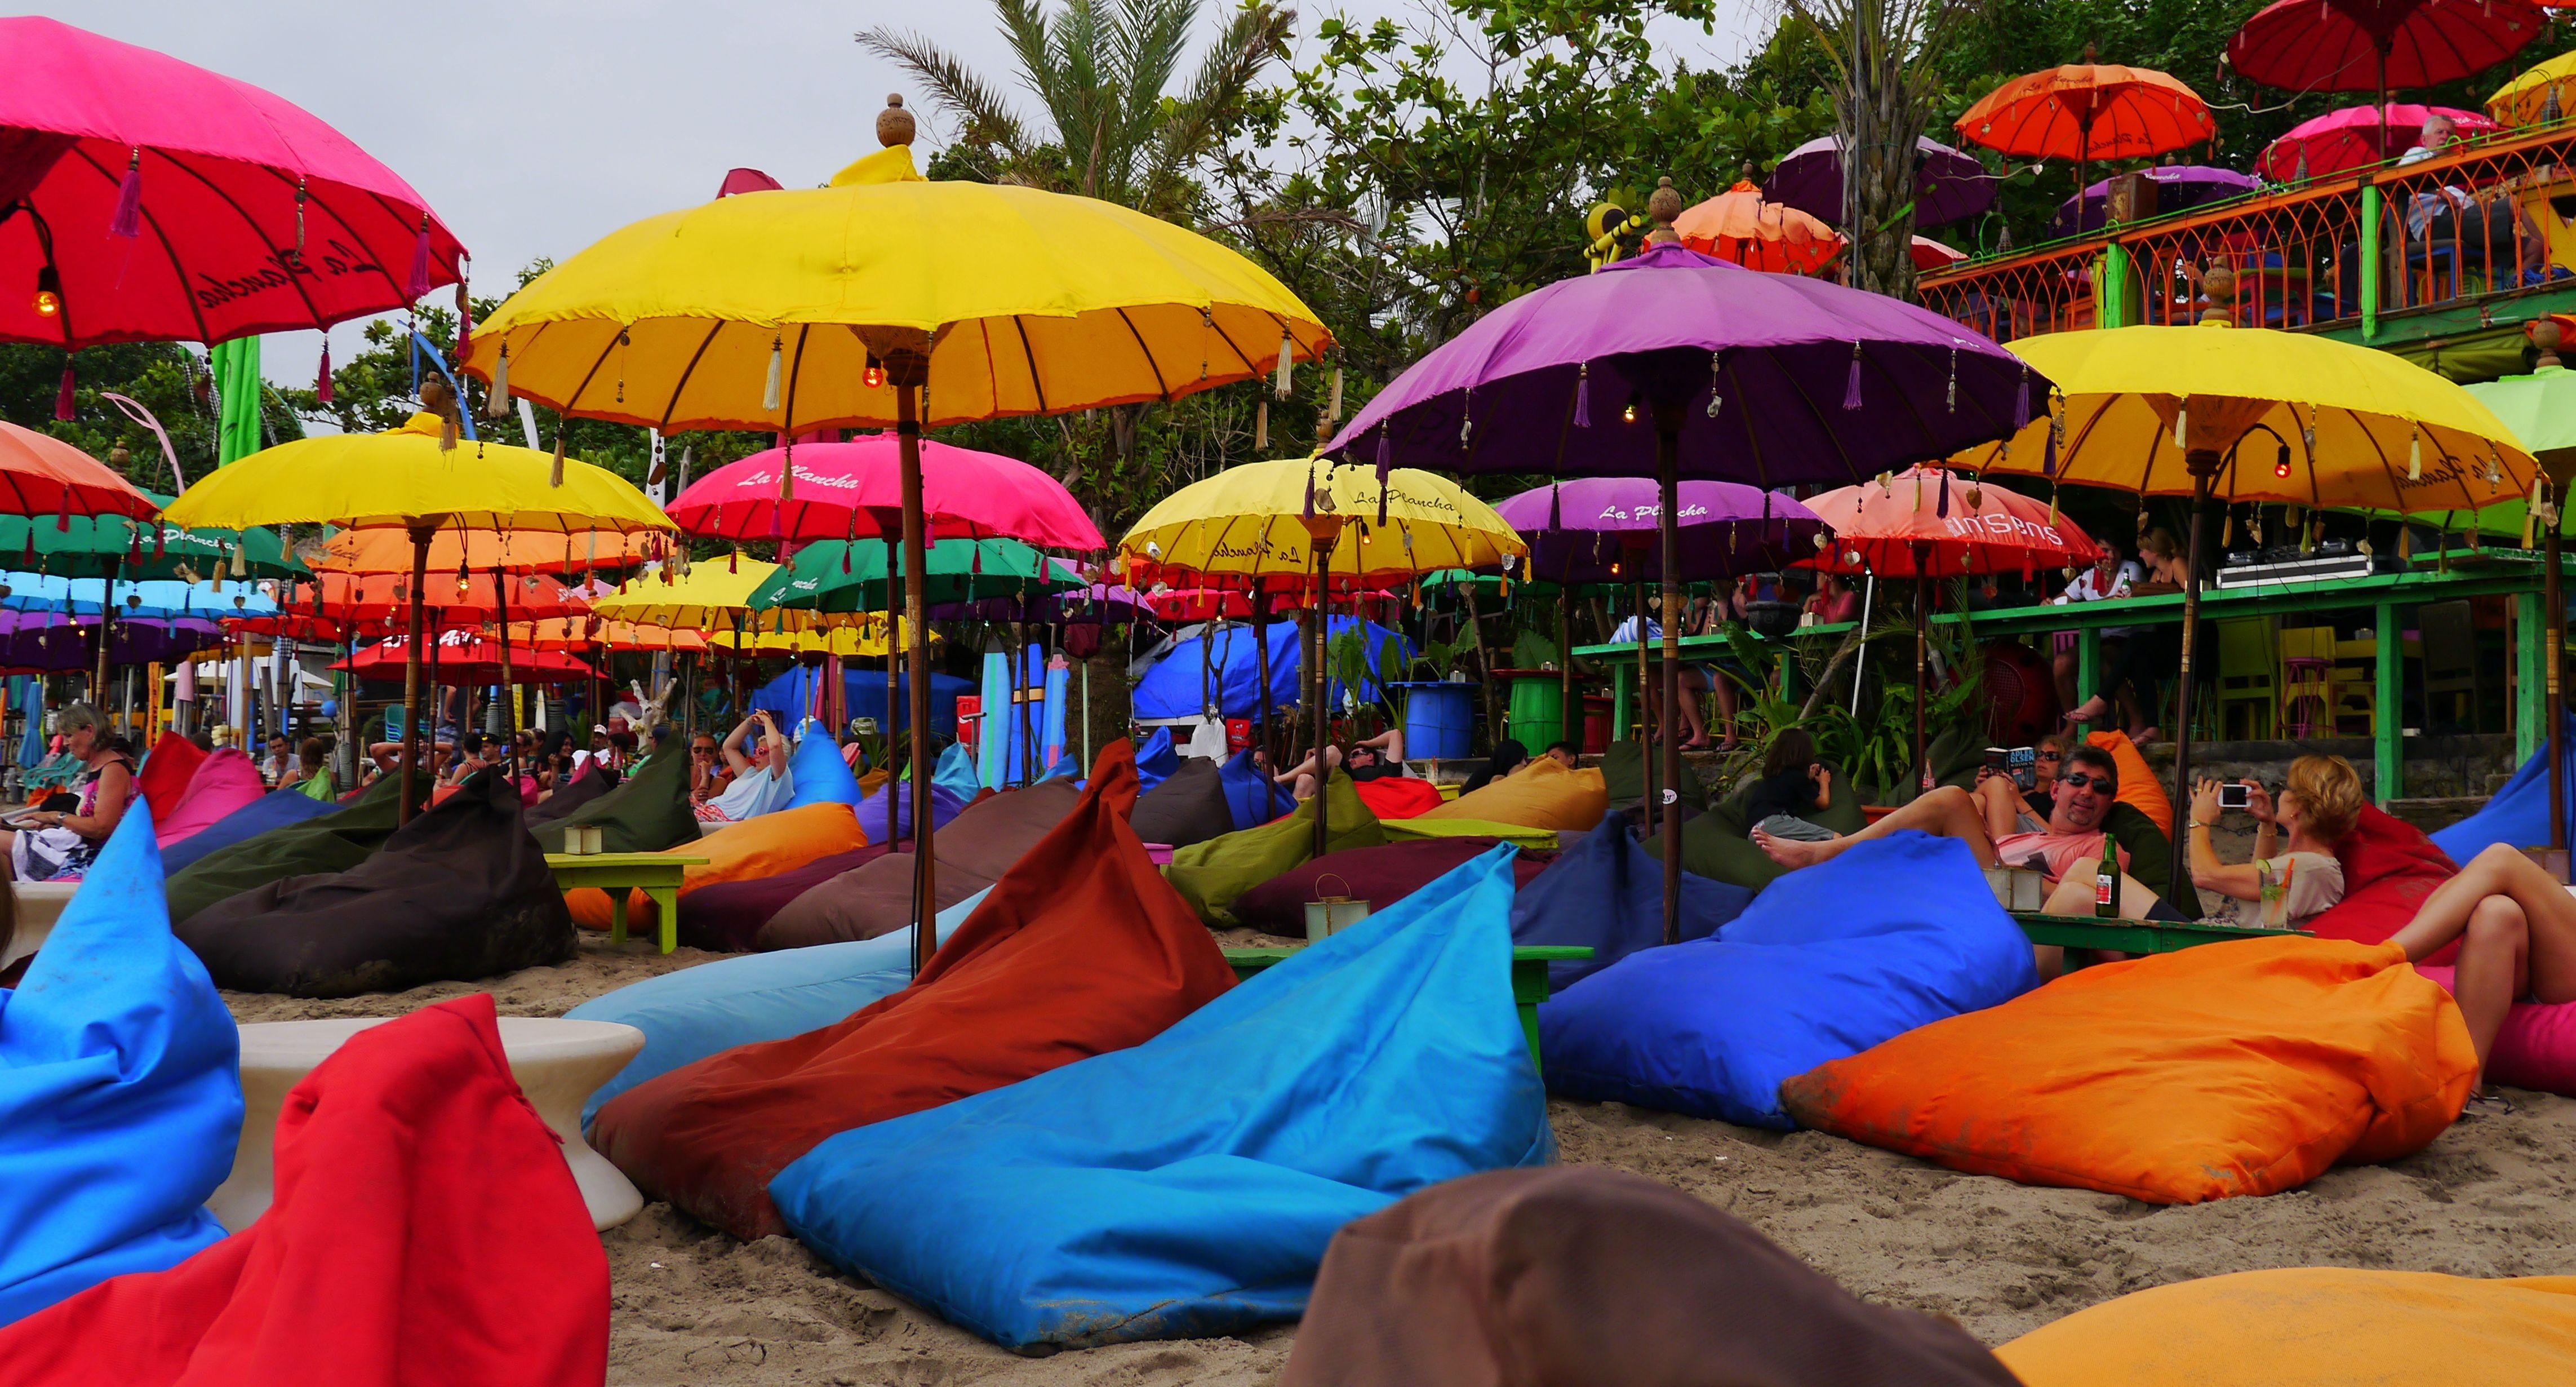 La Plancha beach bar, Seminyak, Bali A good place to